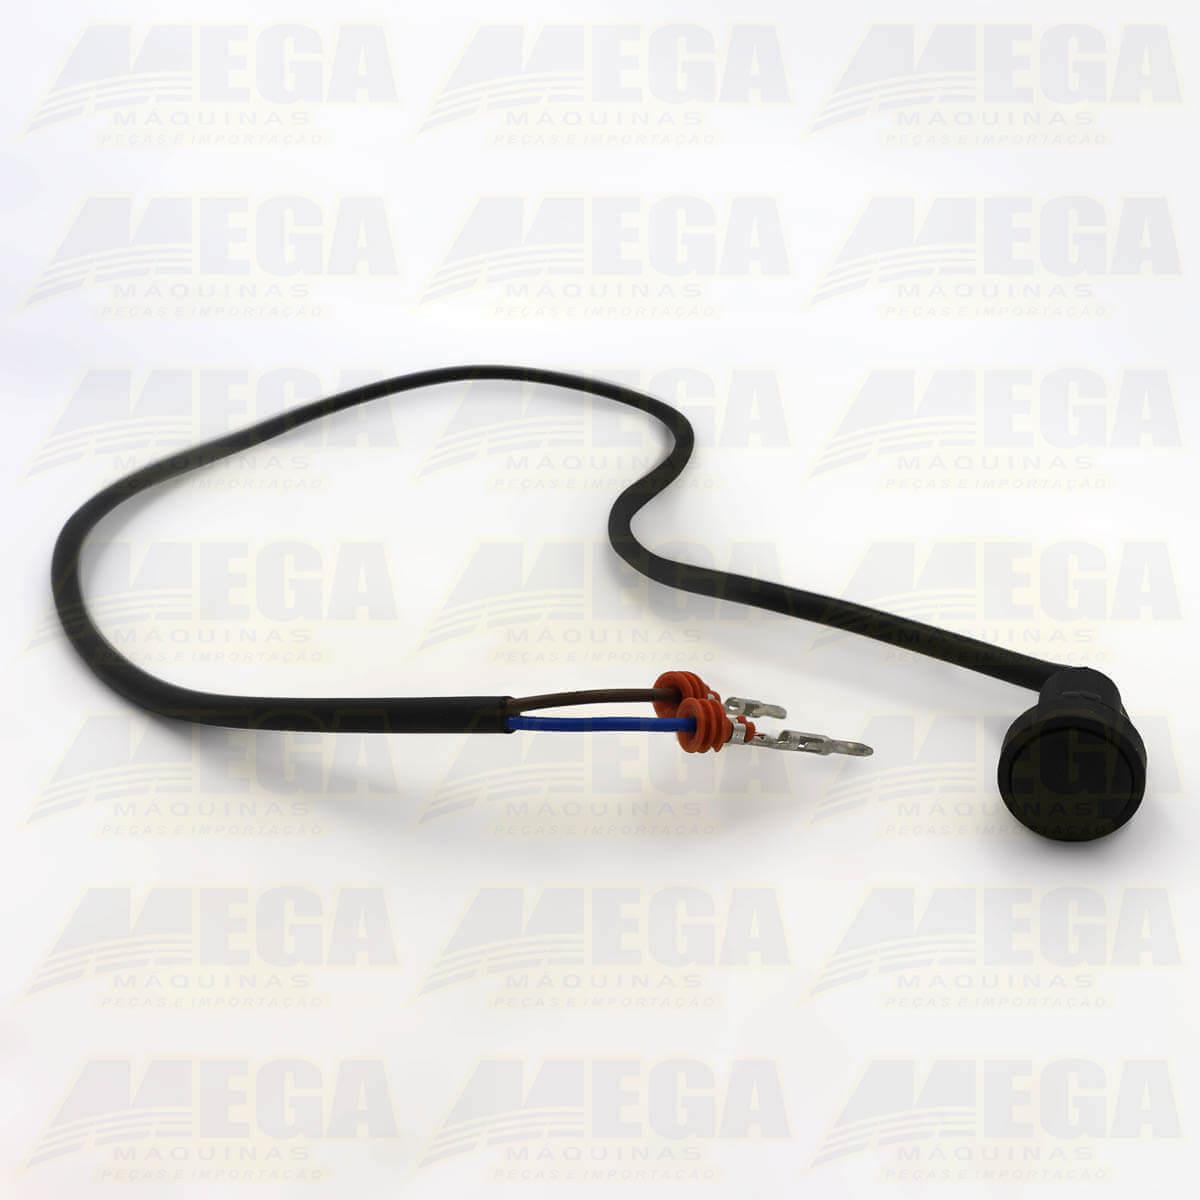 Interruptor Micro do Sensor da Manopla - 701/42600